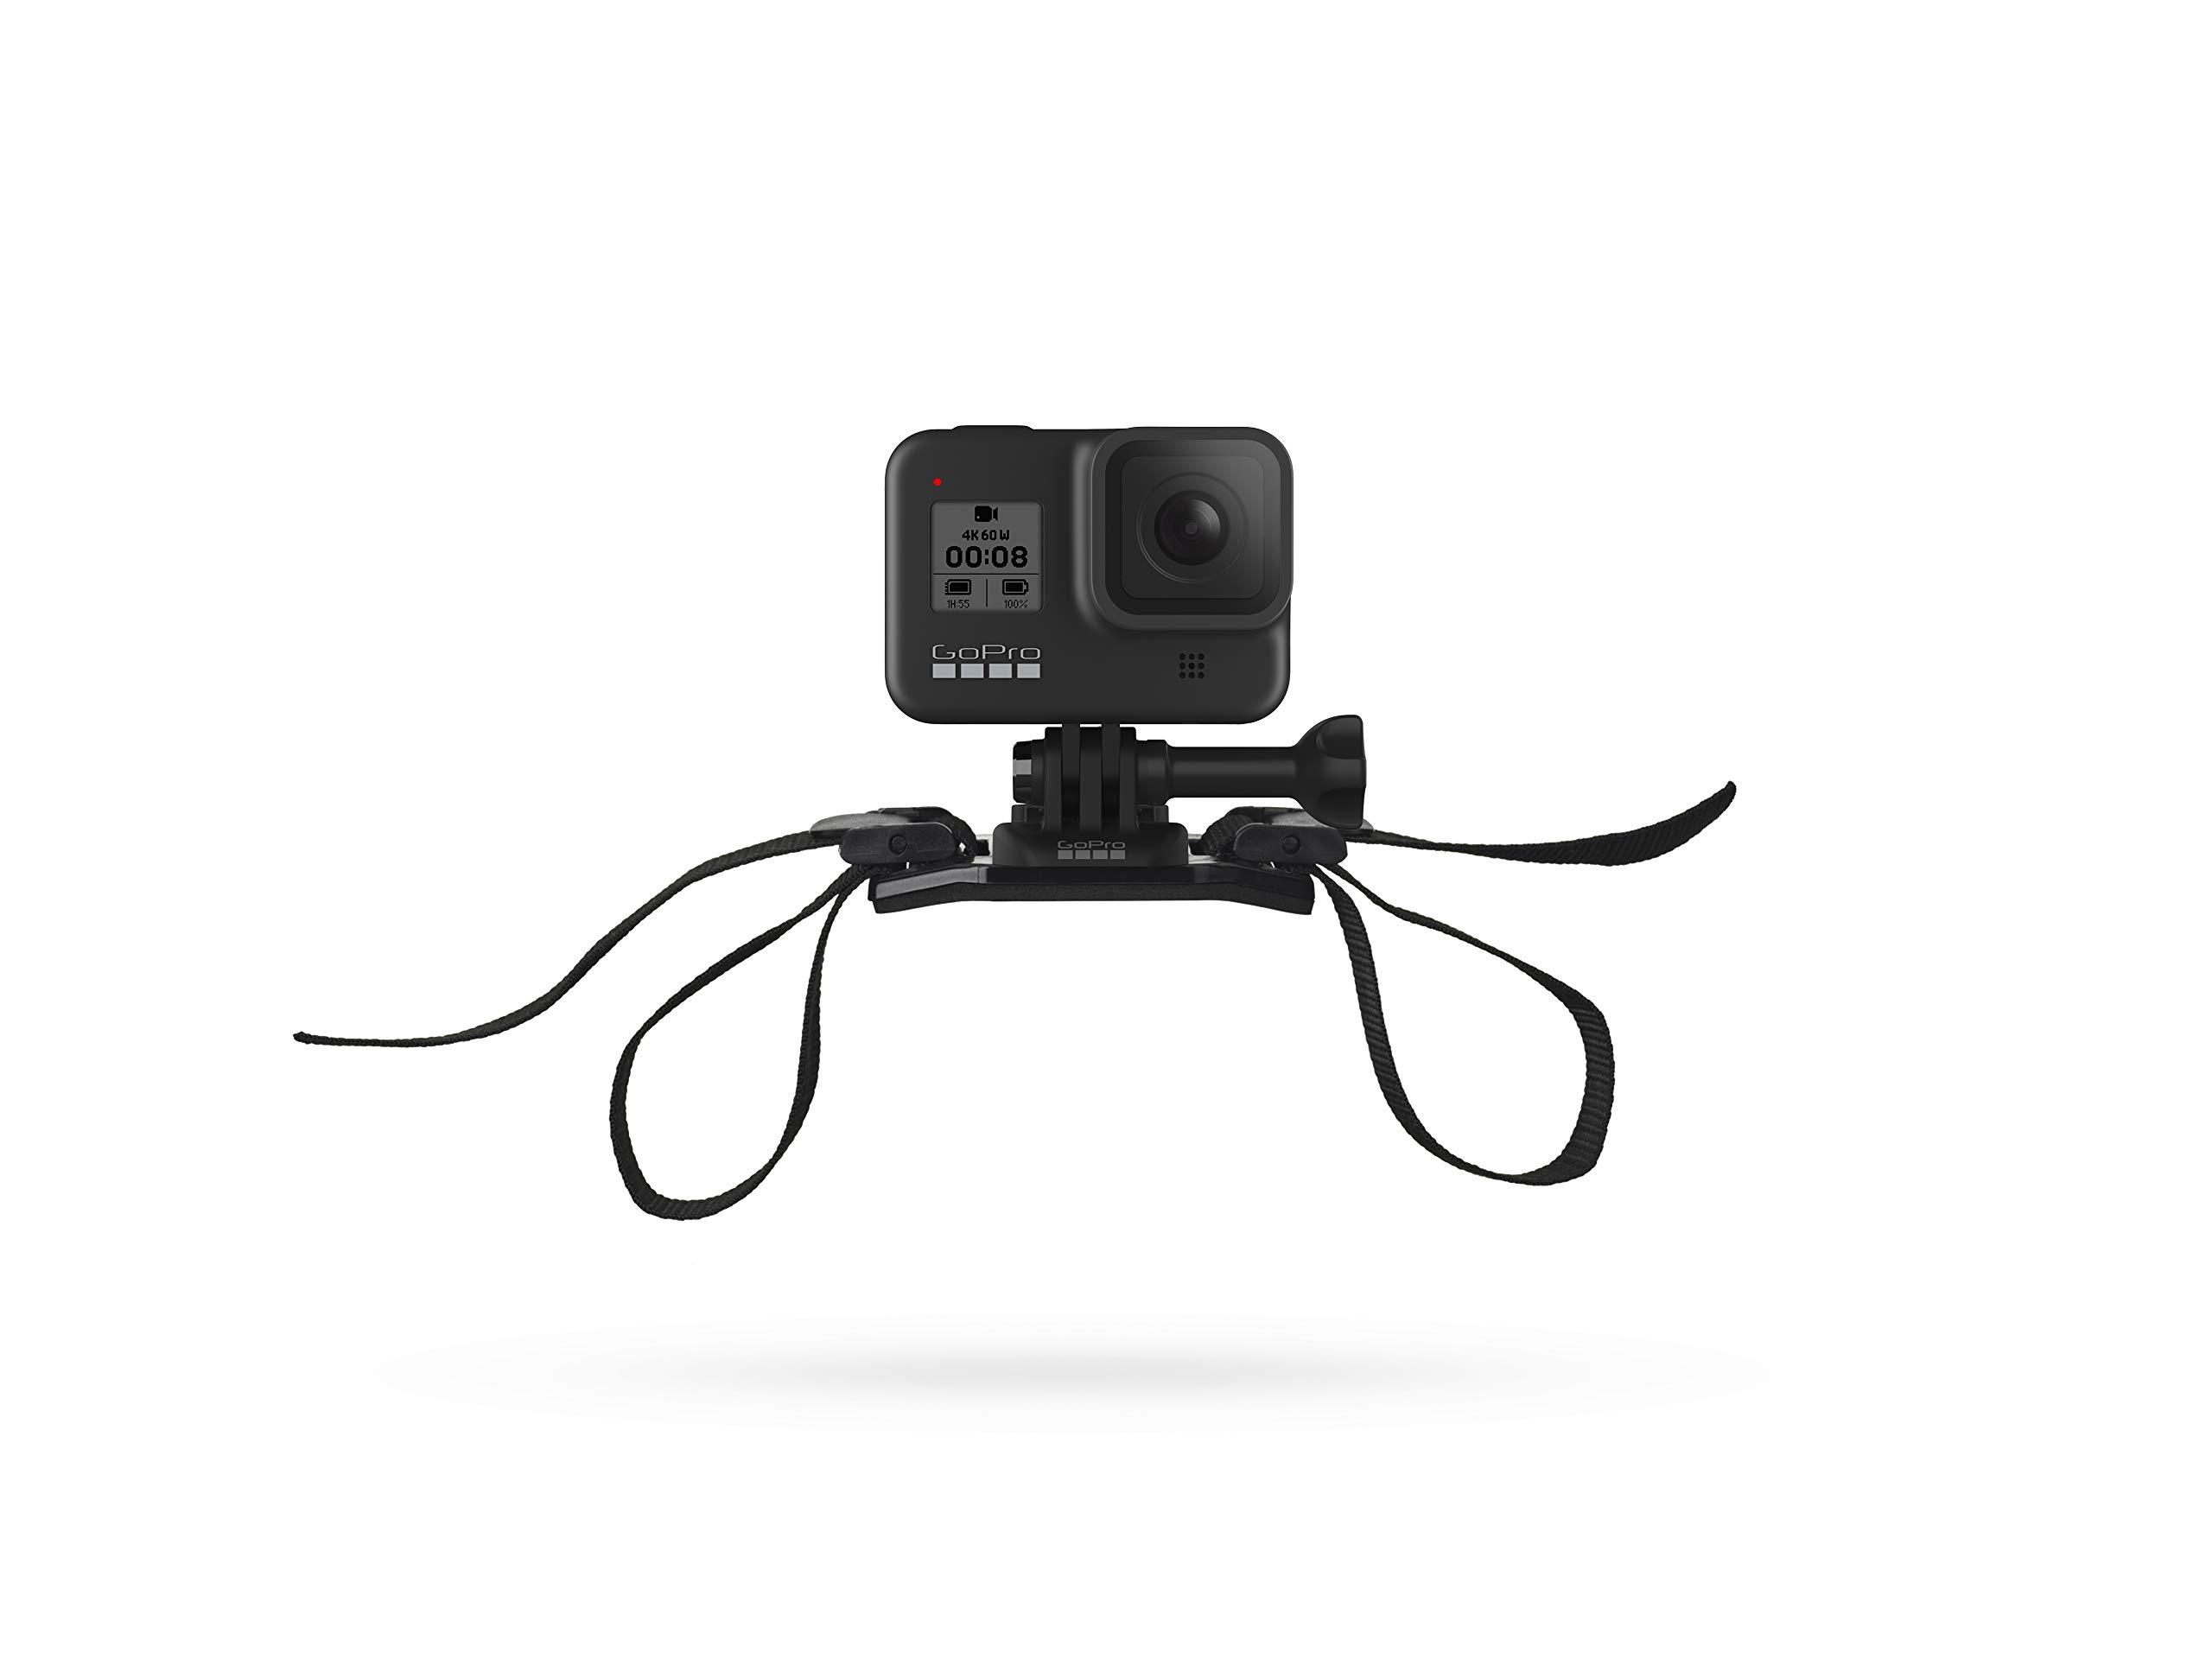 GoPro Vented Helmet Strap Mount (All GoPro Cameras) - Official GoPro Mount by GoPro